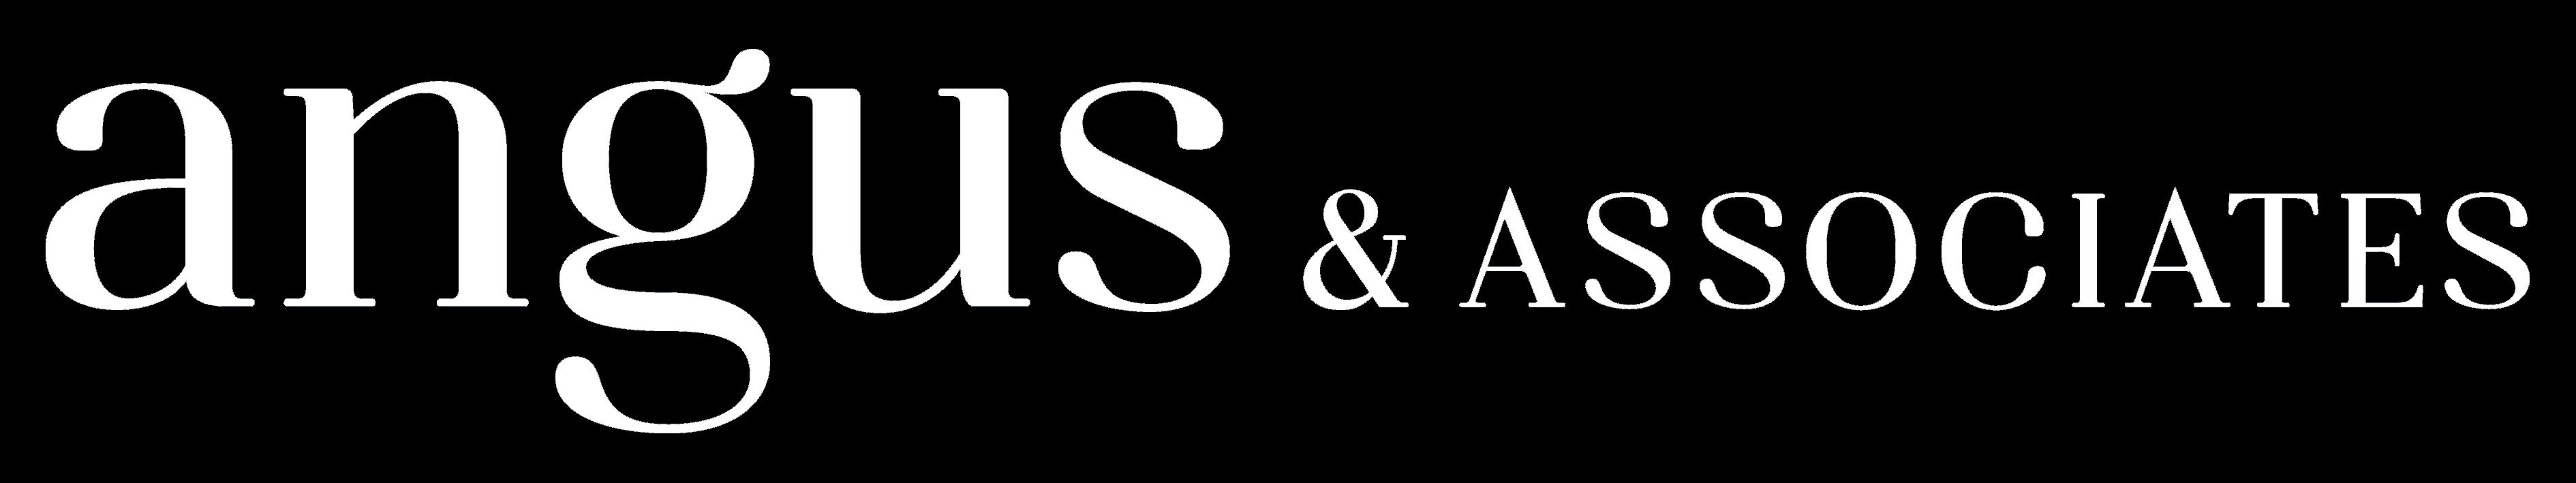 Angus & Associates